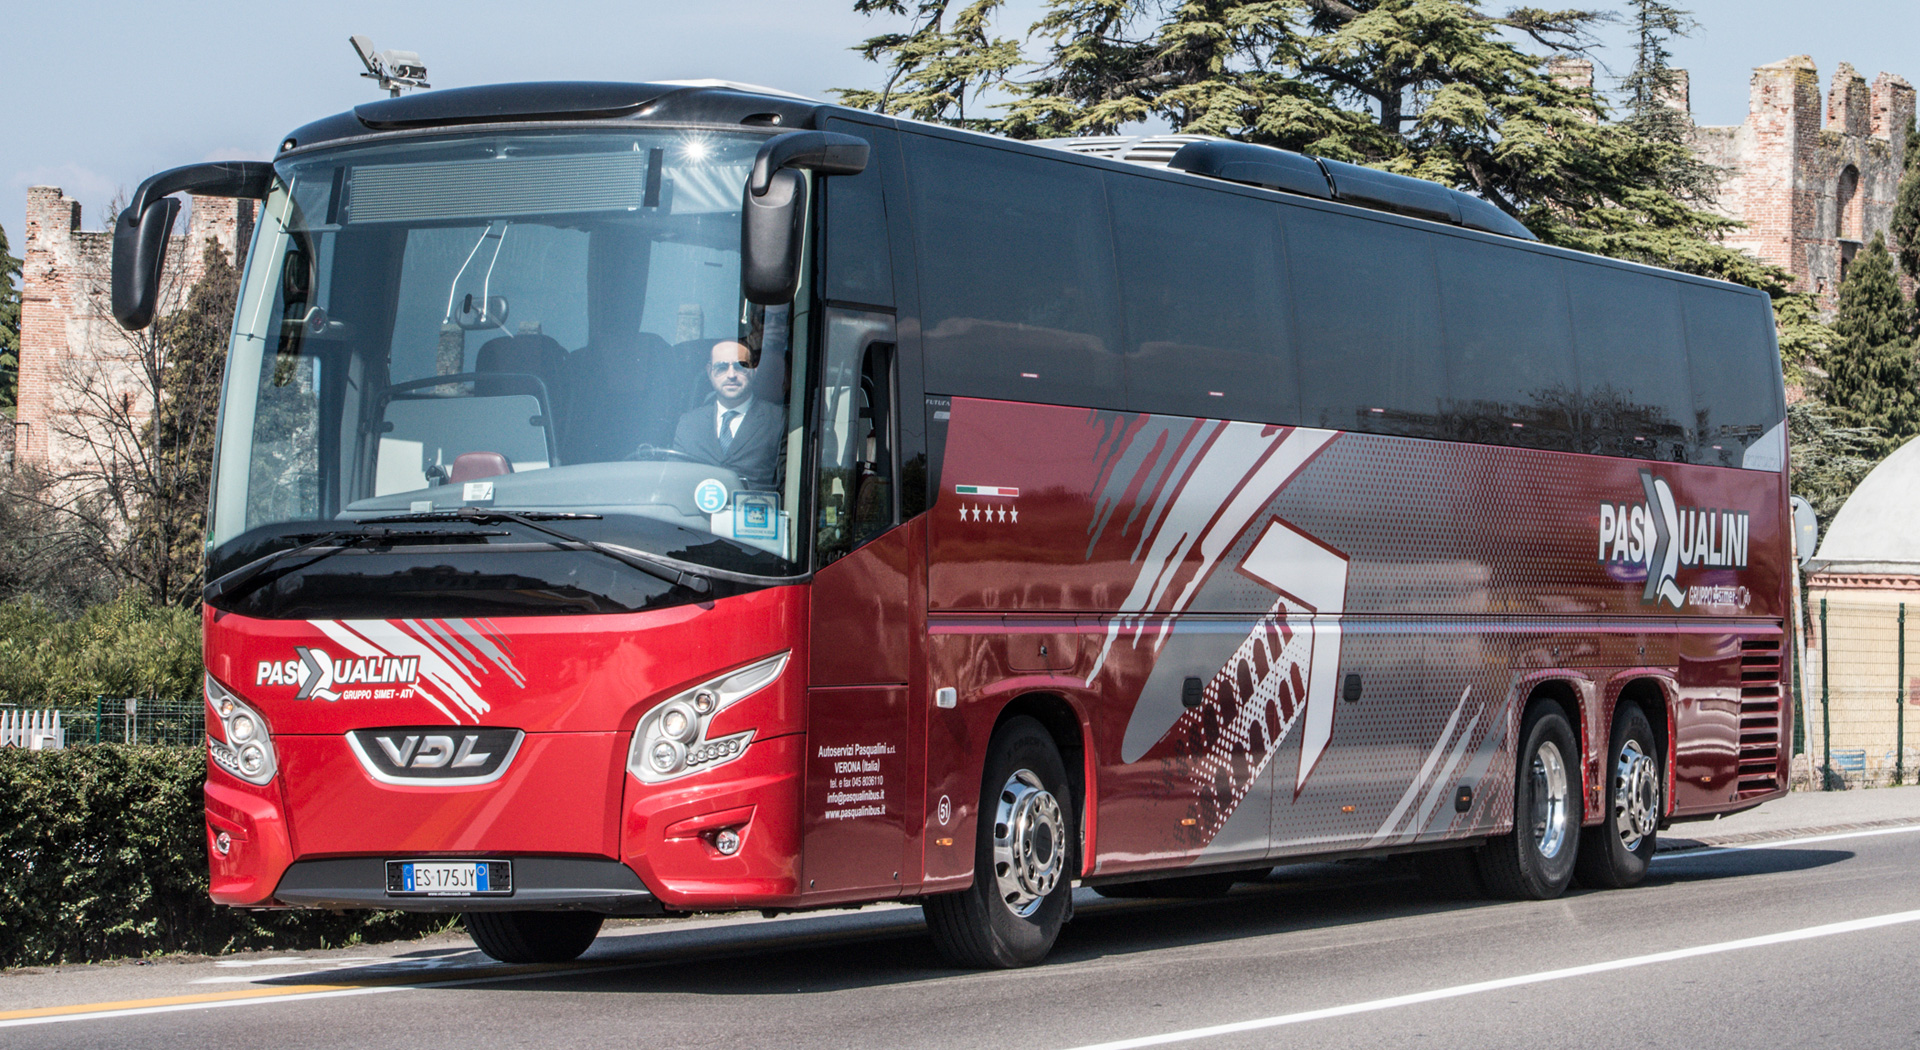 Vdl Futura Pasqualini Bus 1